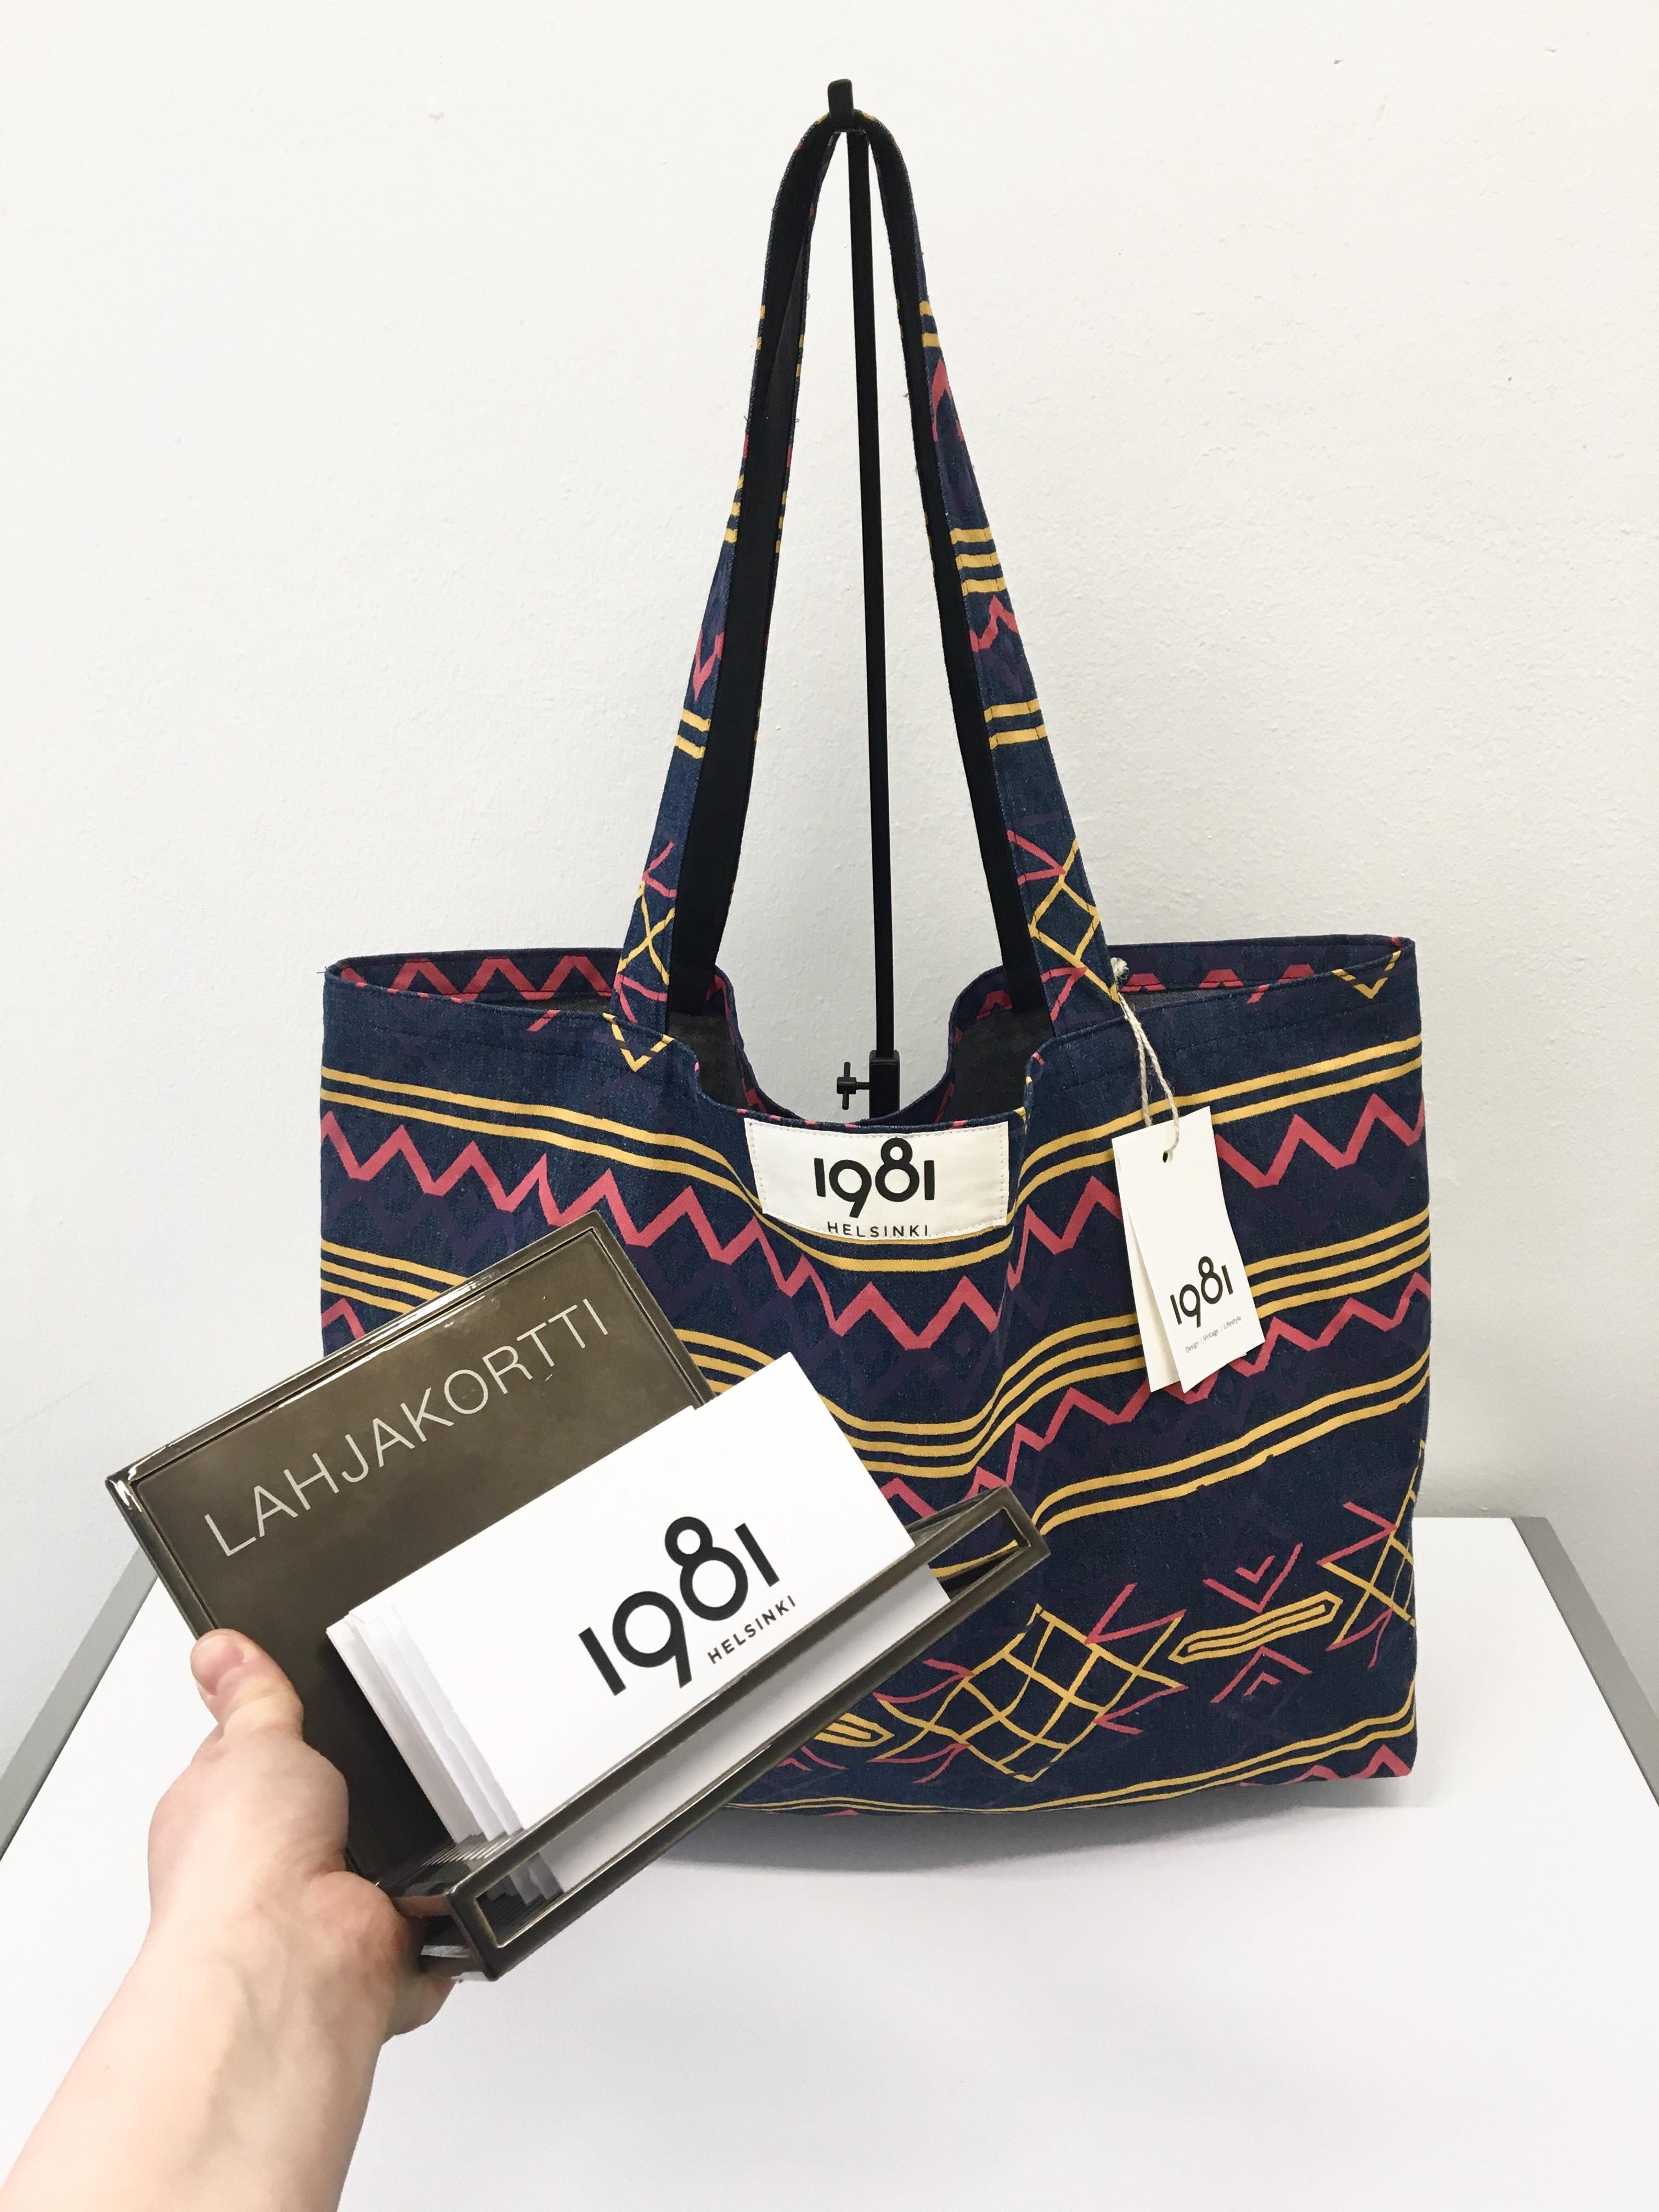 Onni+Lahjakortti/Onni+Gift Card